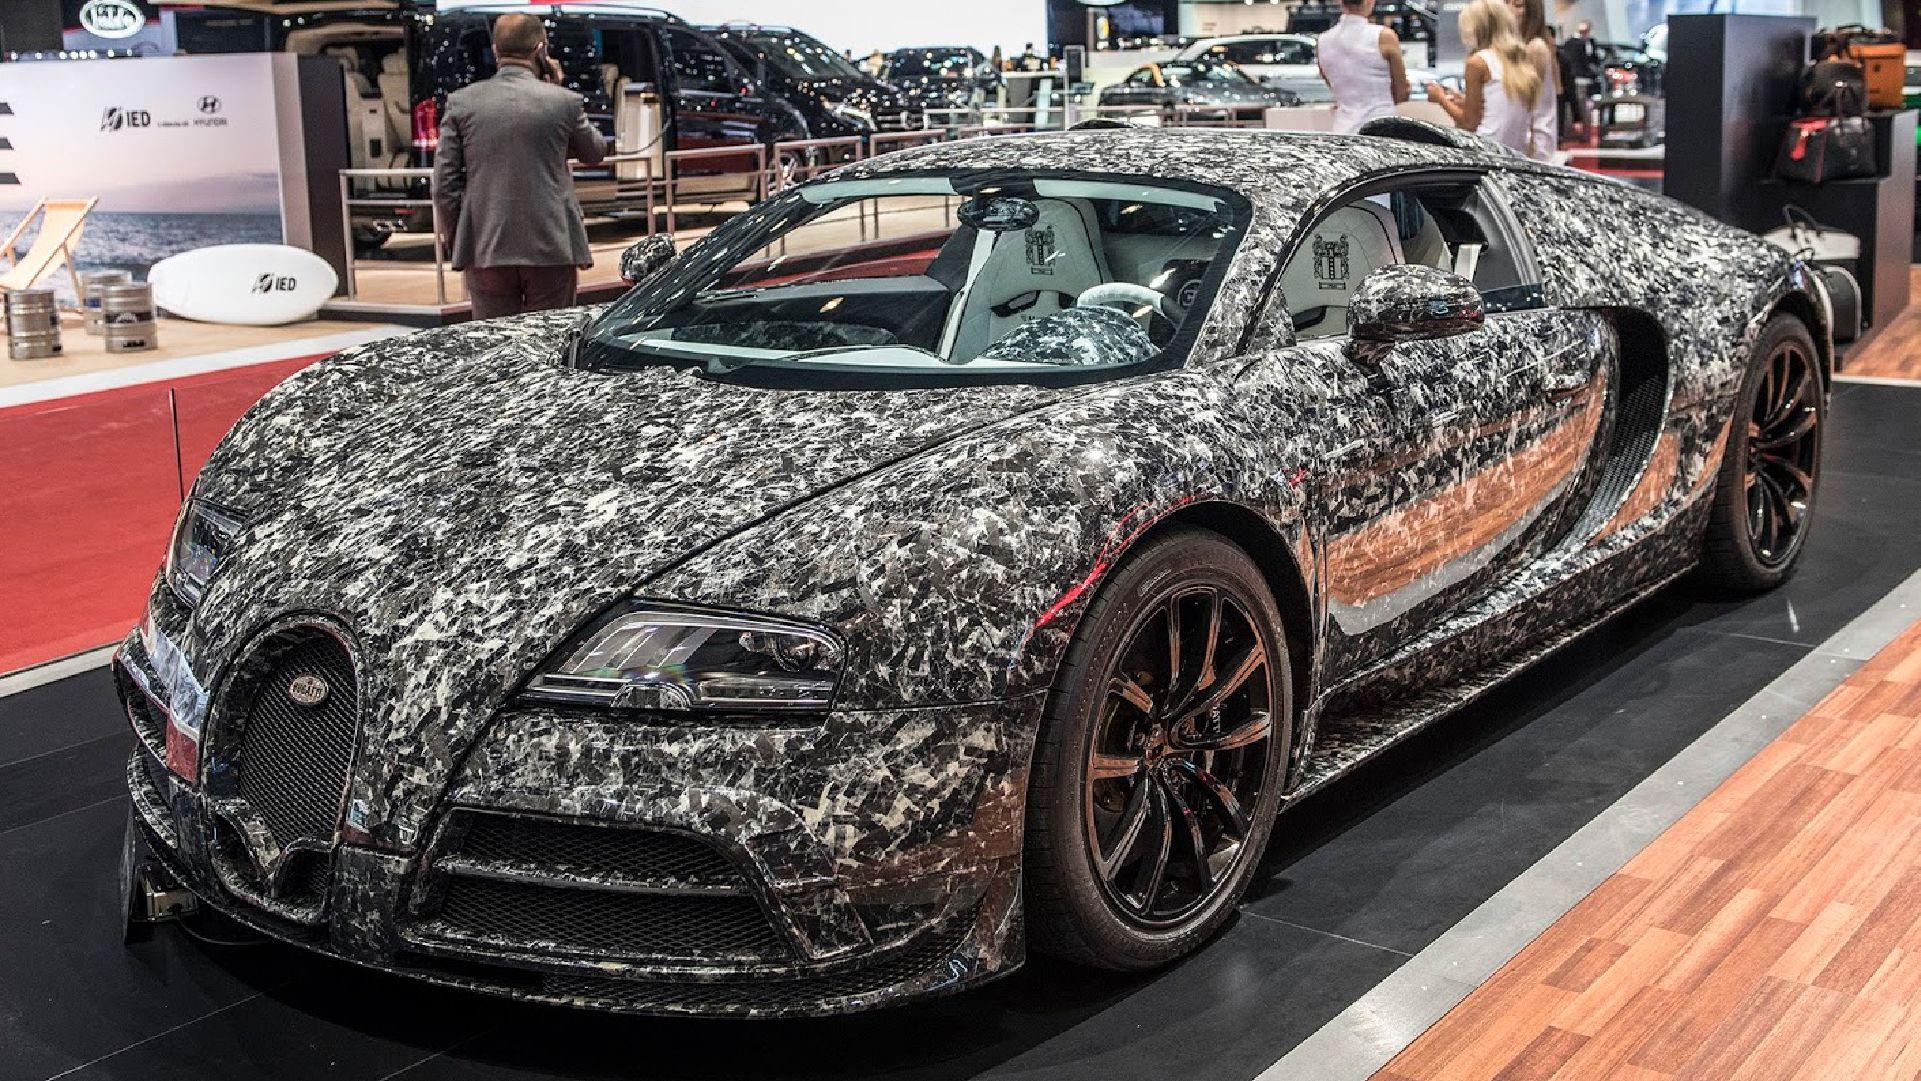 Bugatti Veyron Mansory Vivere Diamond Edition 3 4 Million Supercar Mansory Vivere Bugatti Veyron Super Car Bugatti Bugatti Veyron